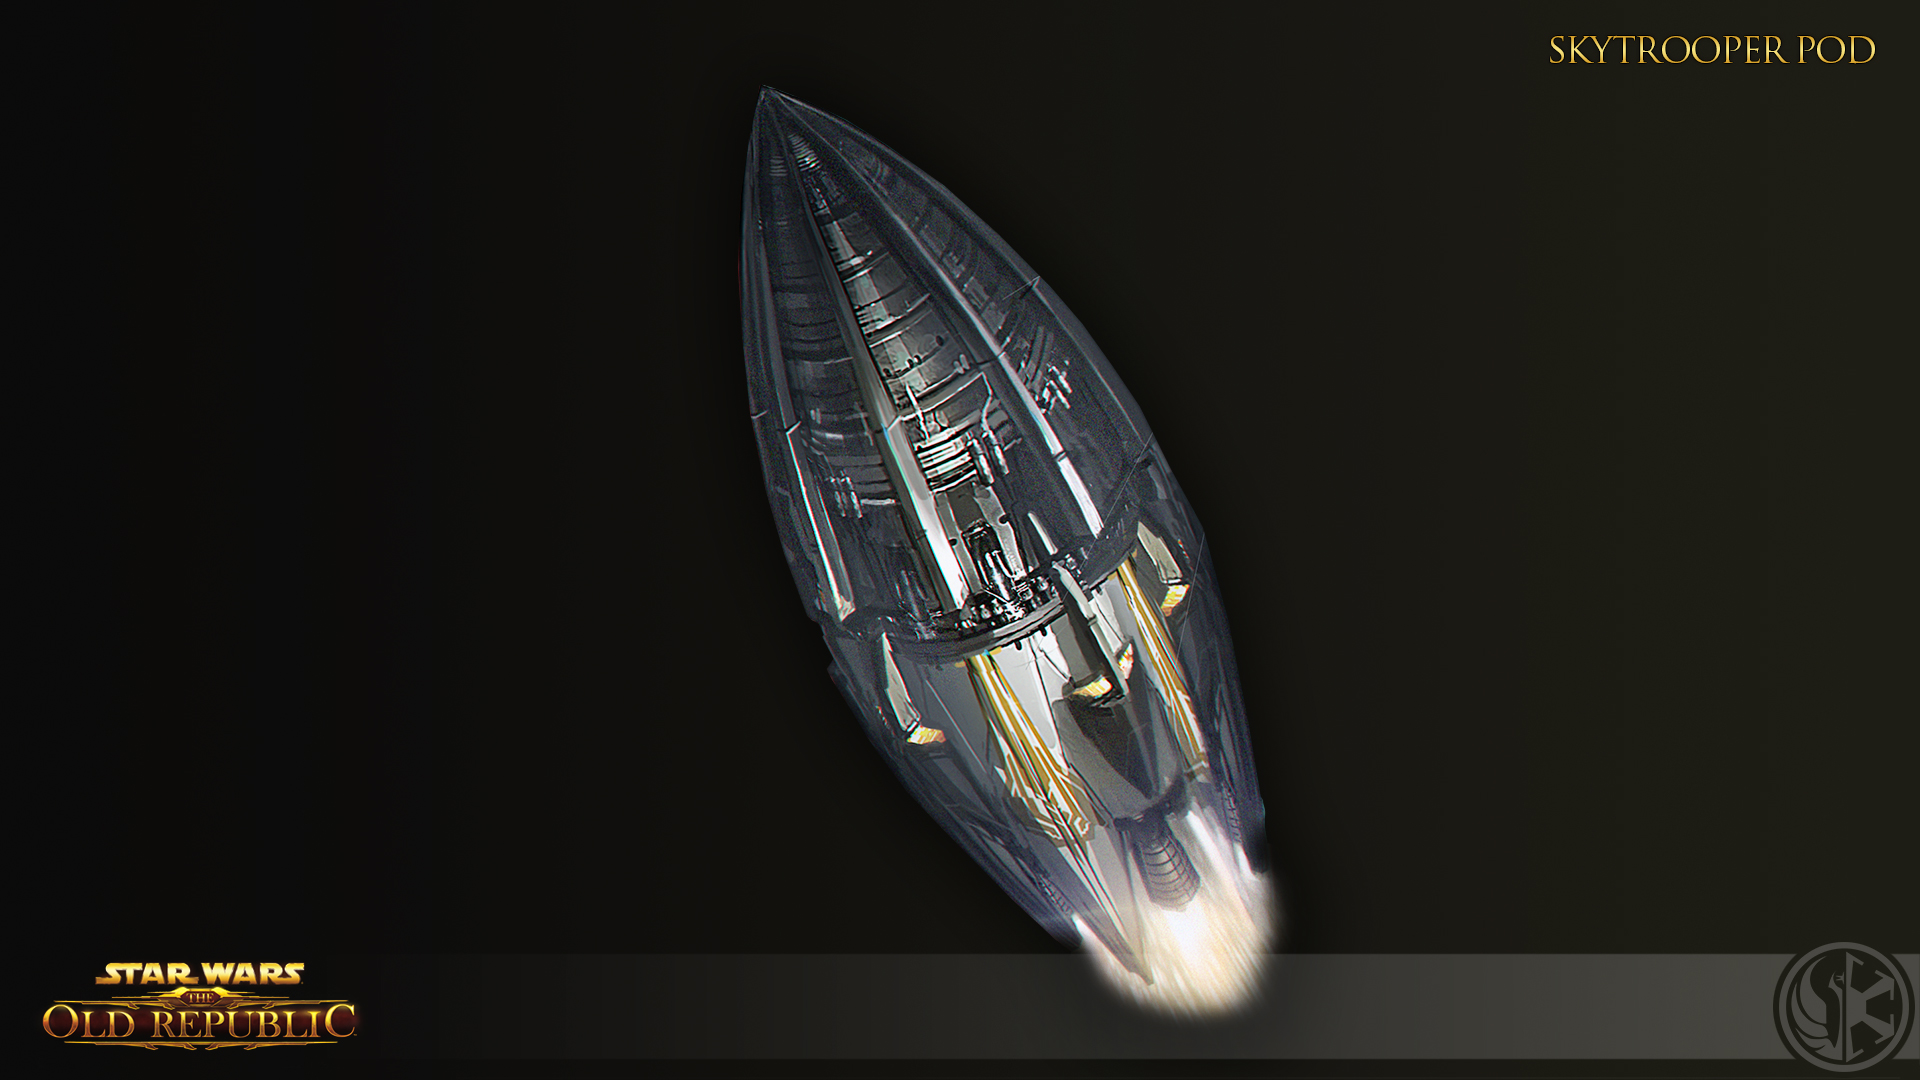 swtor_kotfe_skytrooperpod_concept